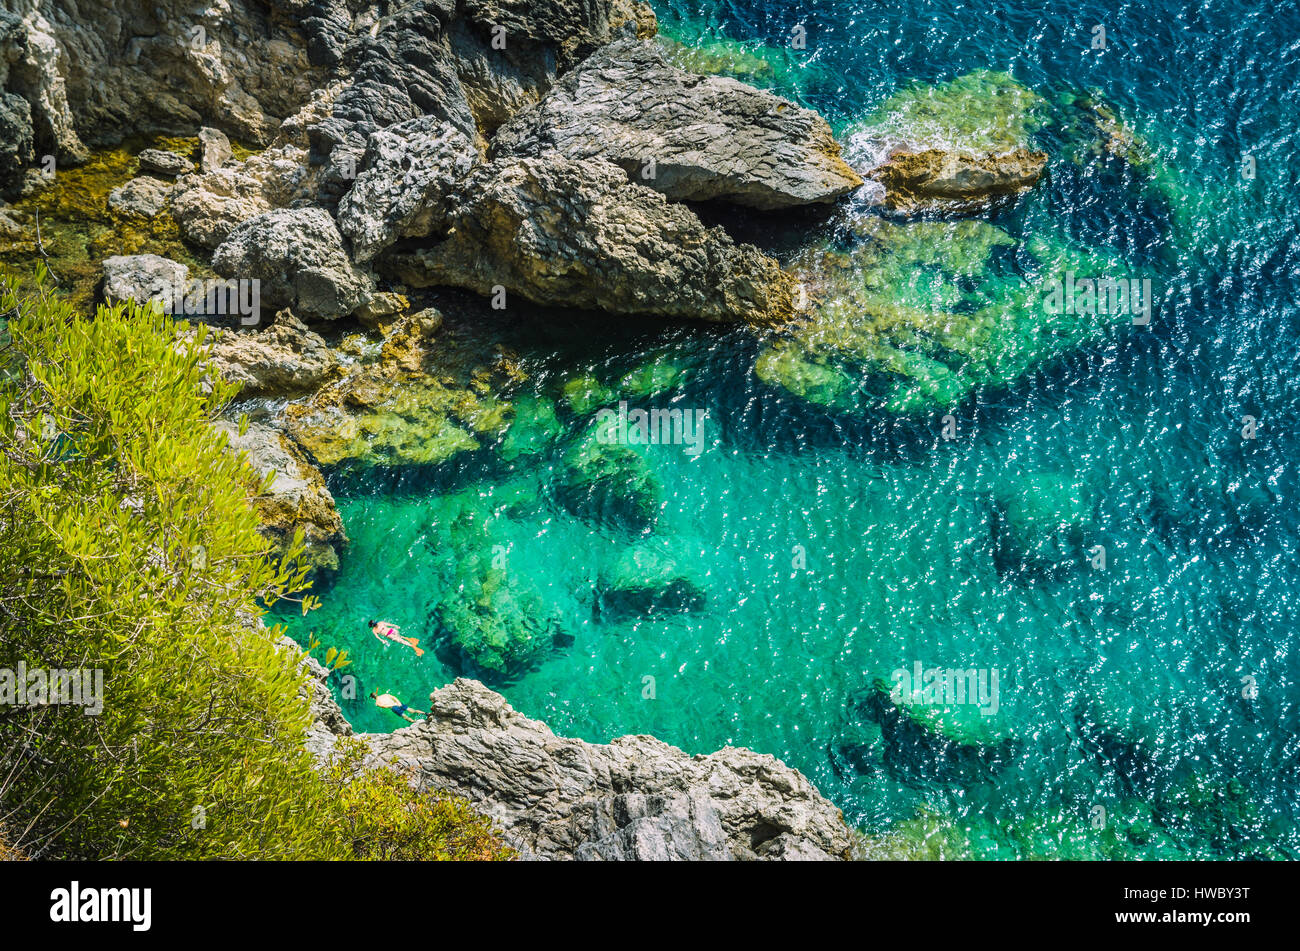 Tourists shorkling between Rocks in Azure Bay of Beautiful Paleokastritsa in Corfu Island, Greece Stock Photo